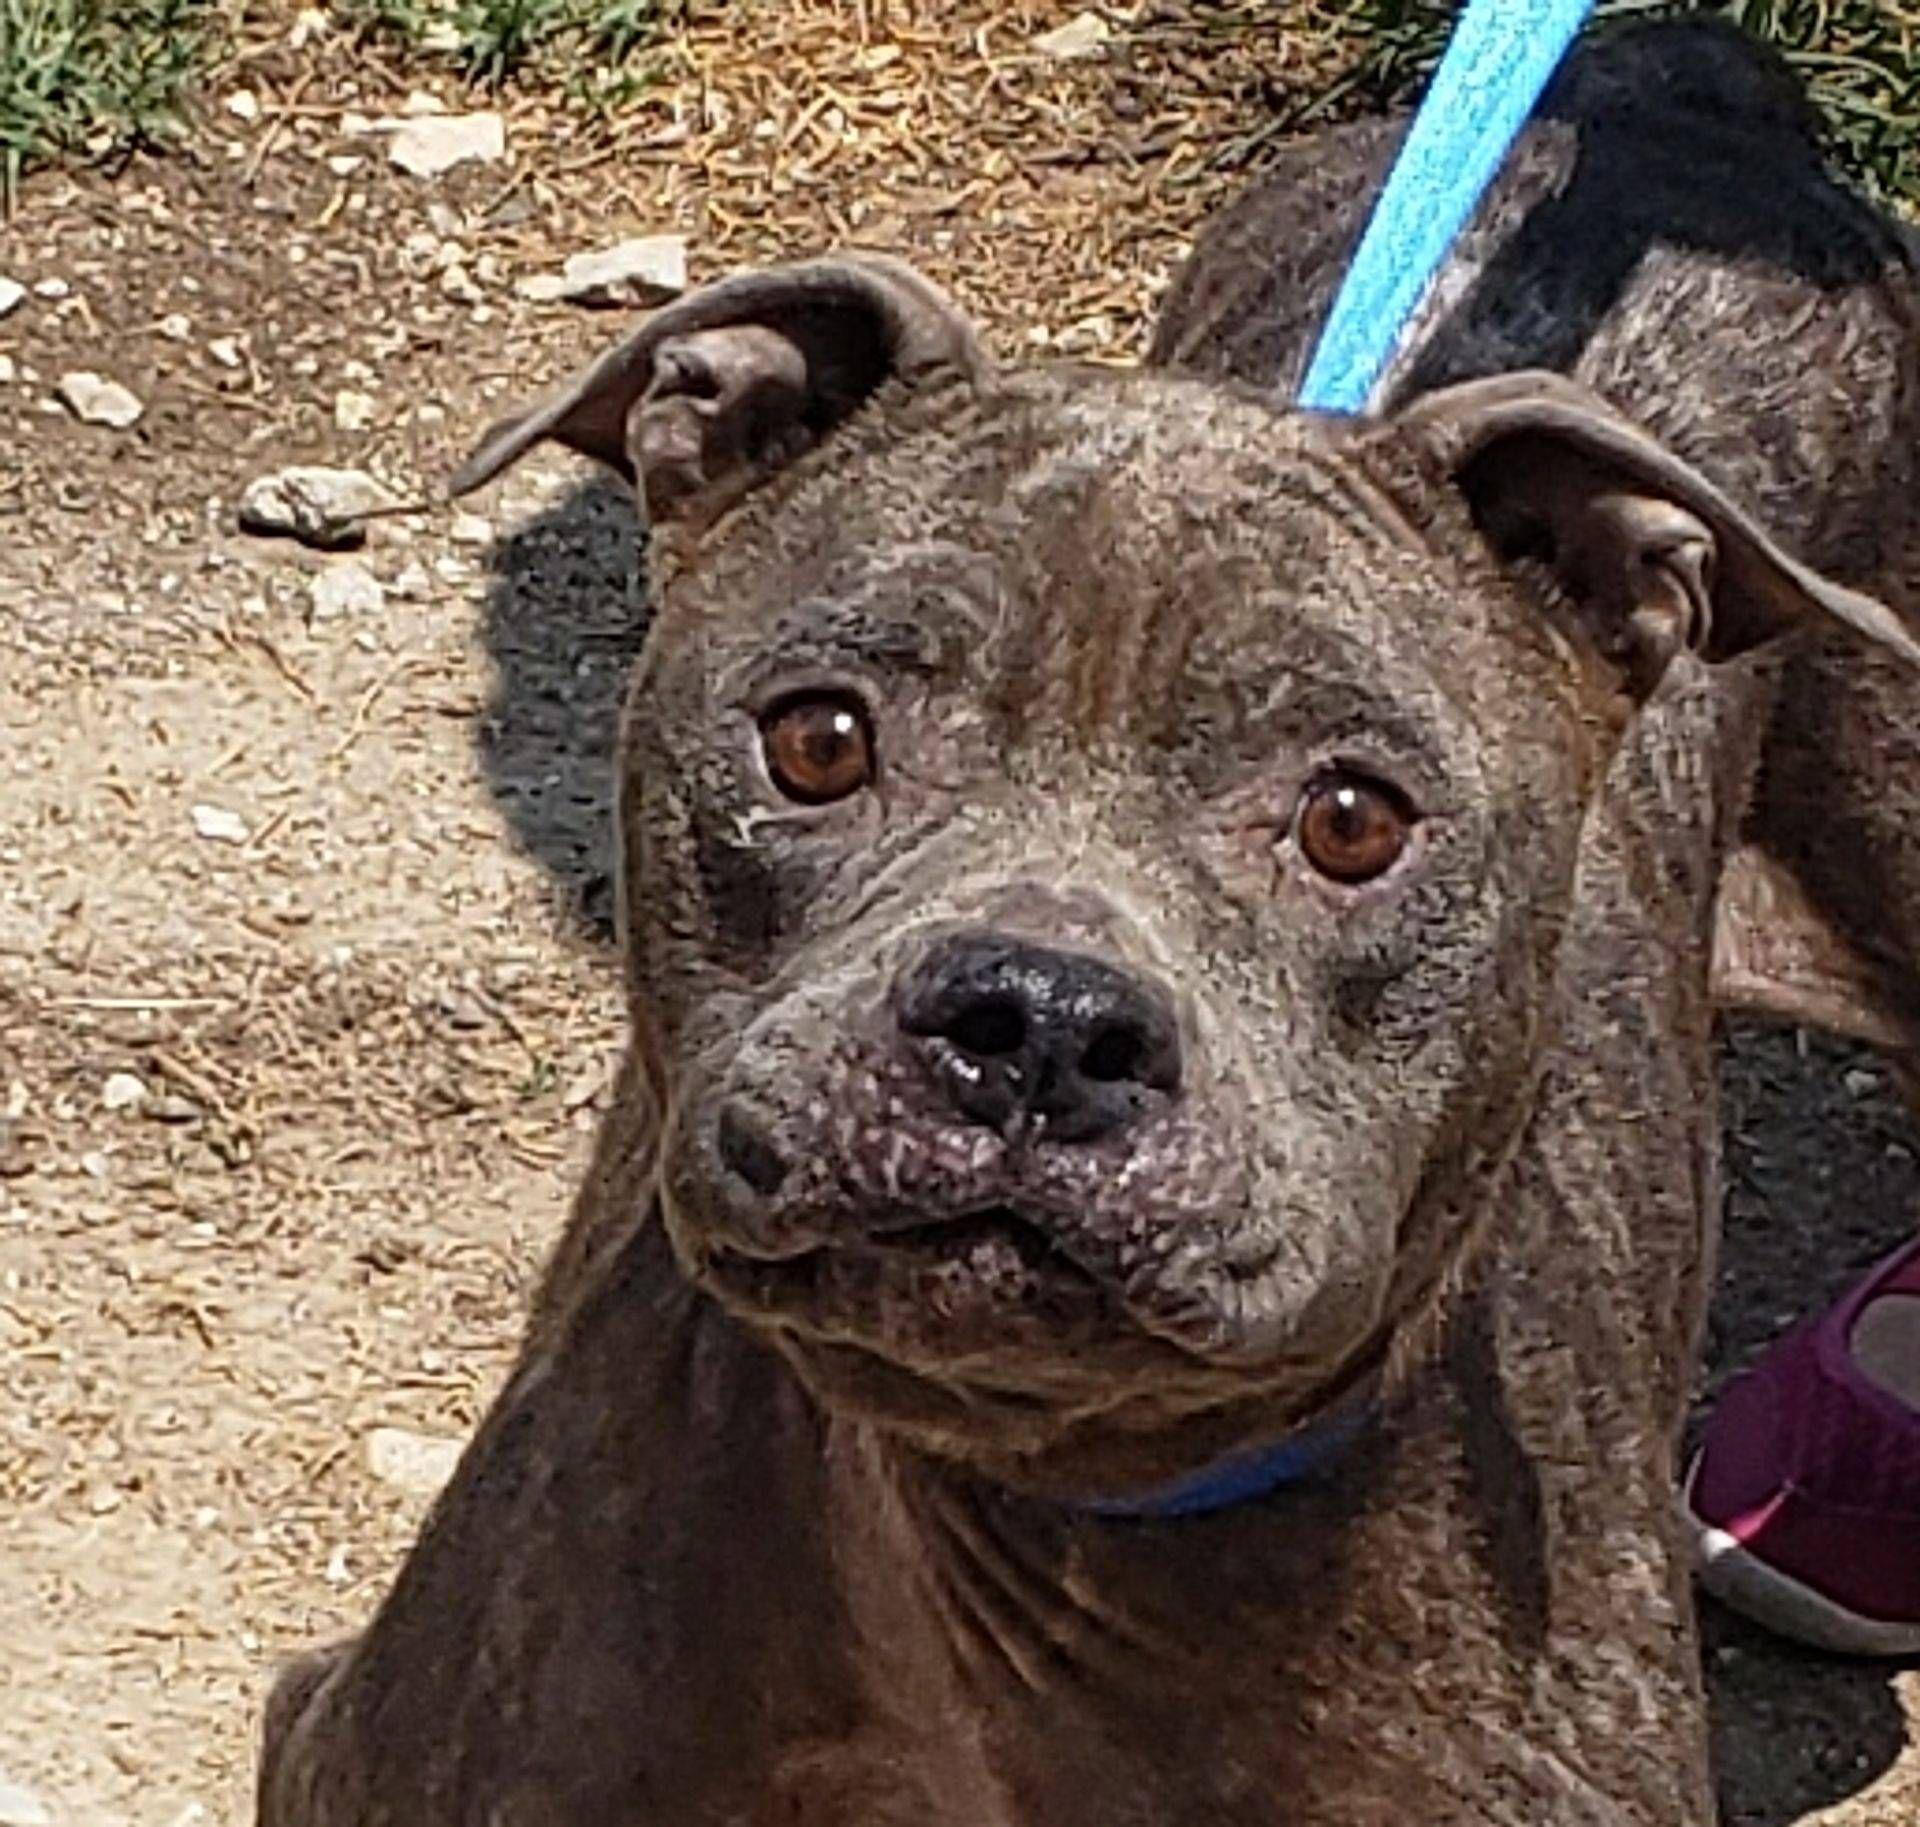 Barking Mad Animal Rescue Non Profit No Kill Shelter Dog Adoption Animal Rescue Cute Puppies